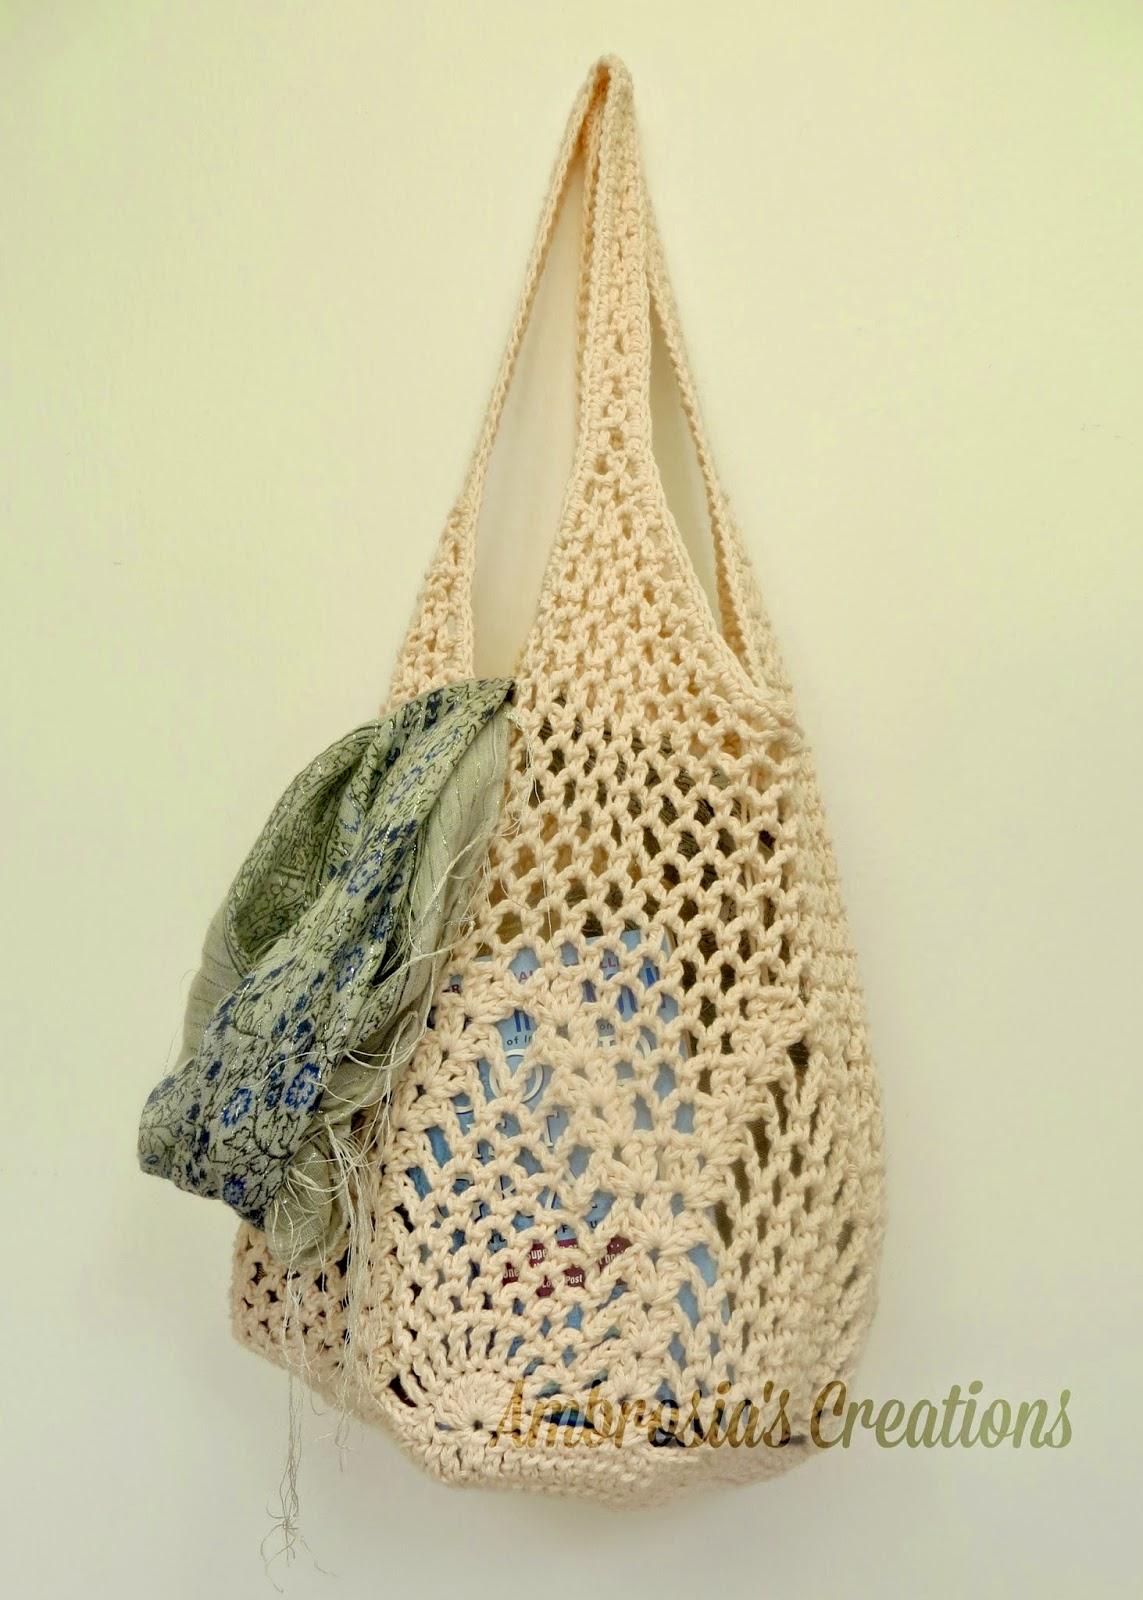 Ambrosia's Creations: Pattern:: Pineapple Crochet Market